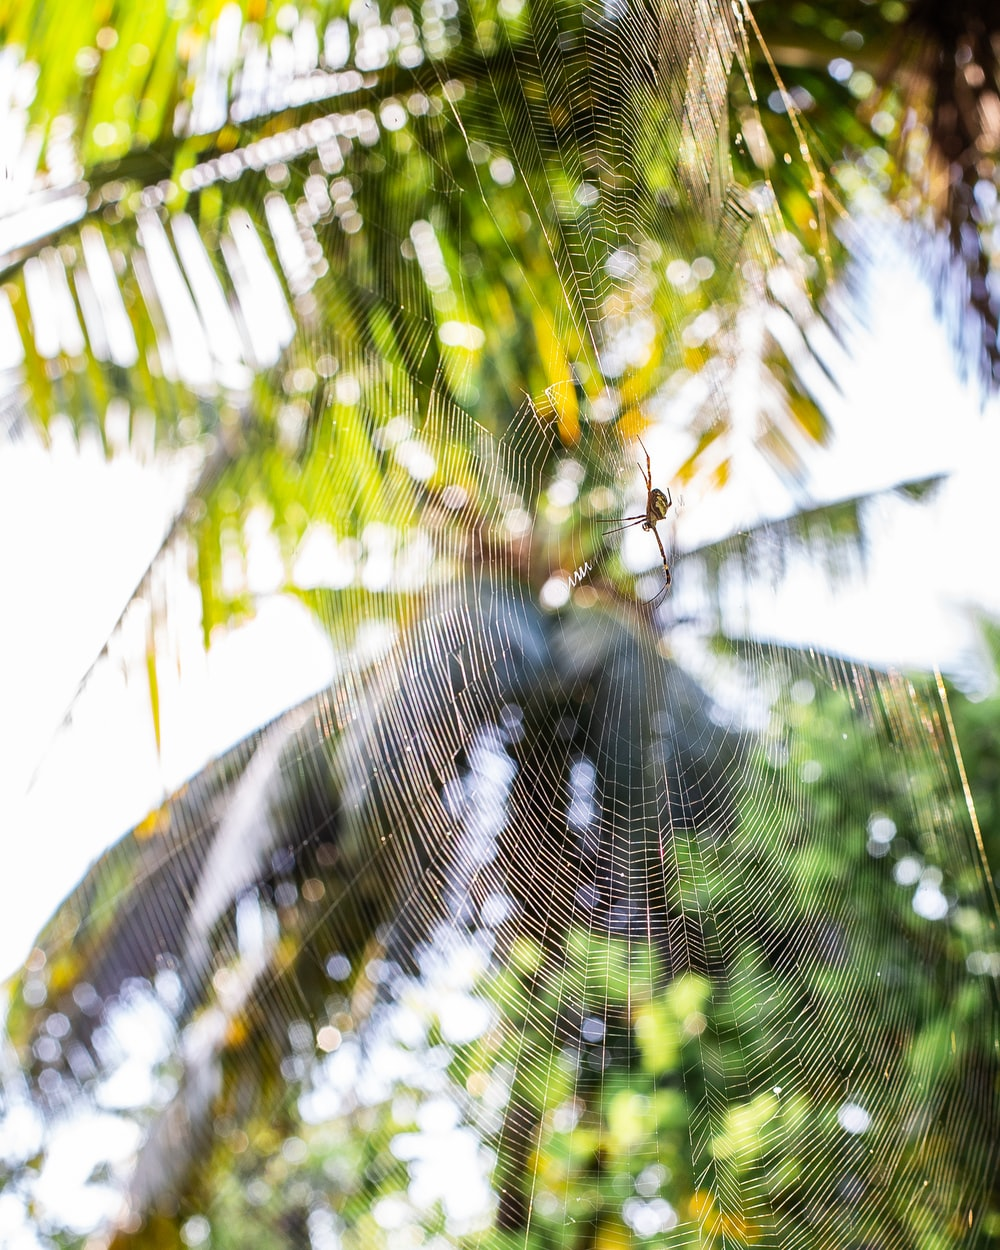 spider web on green leaf tree during daytime